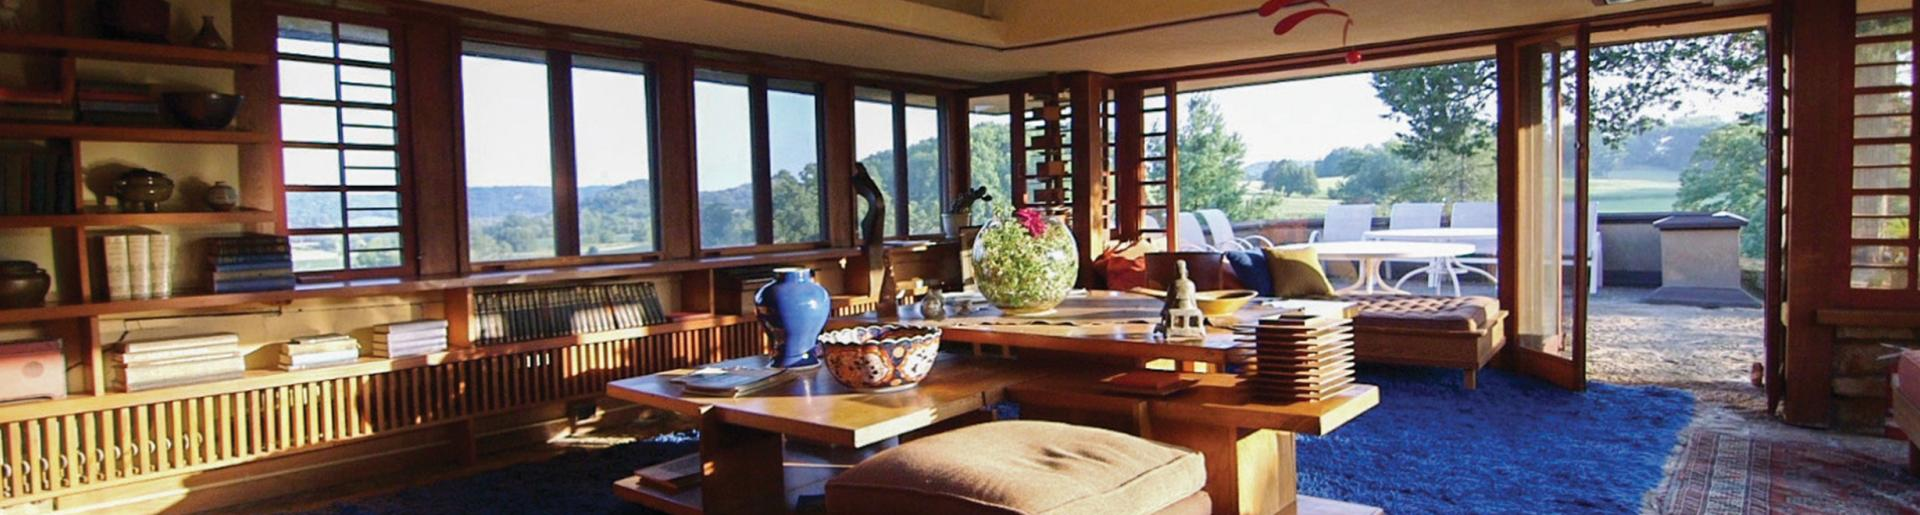 Frank Lloyd Wright Taliesin Preservation